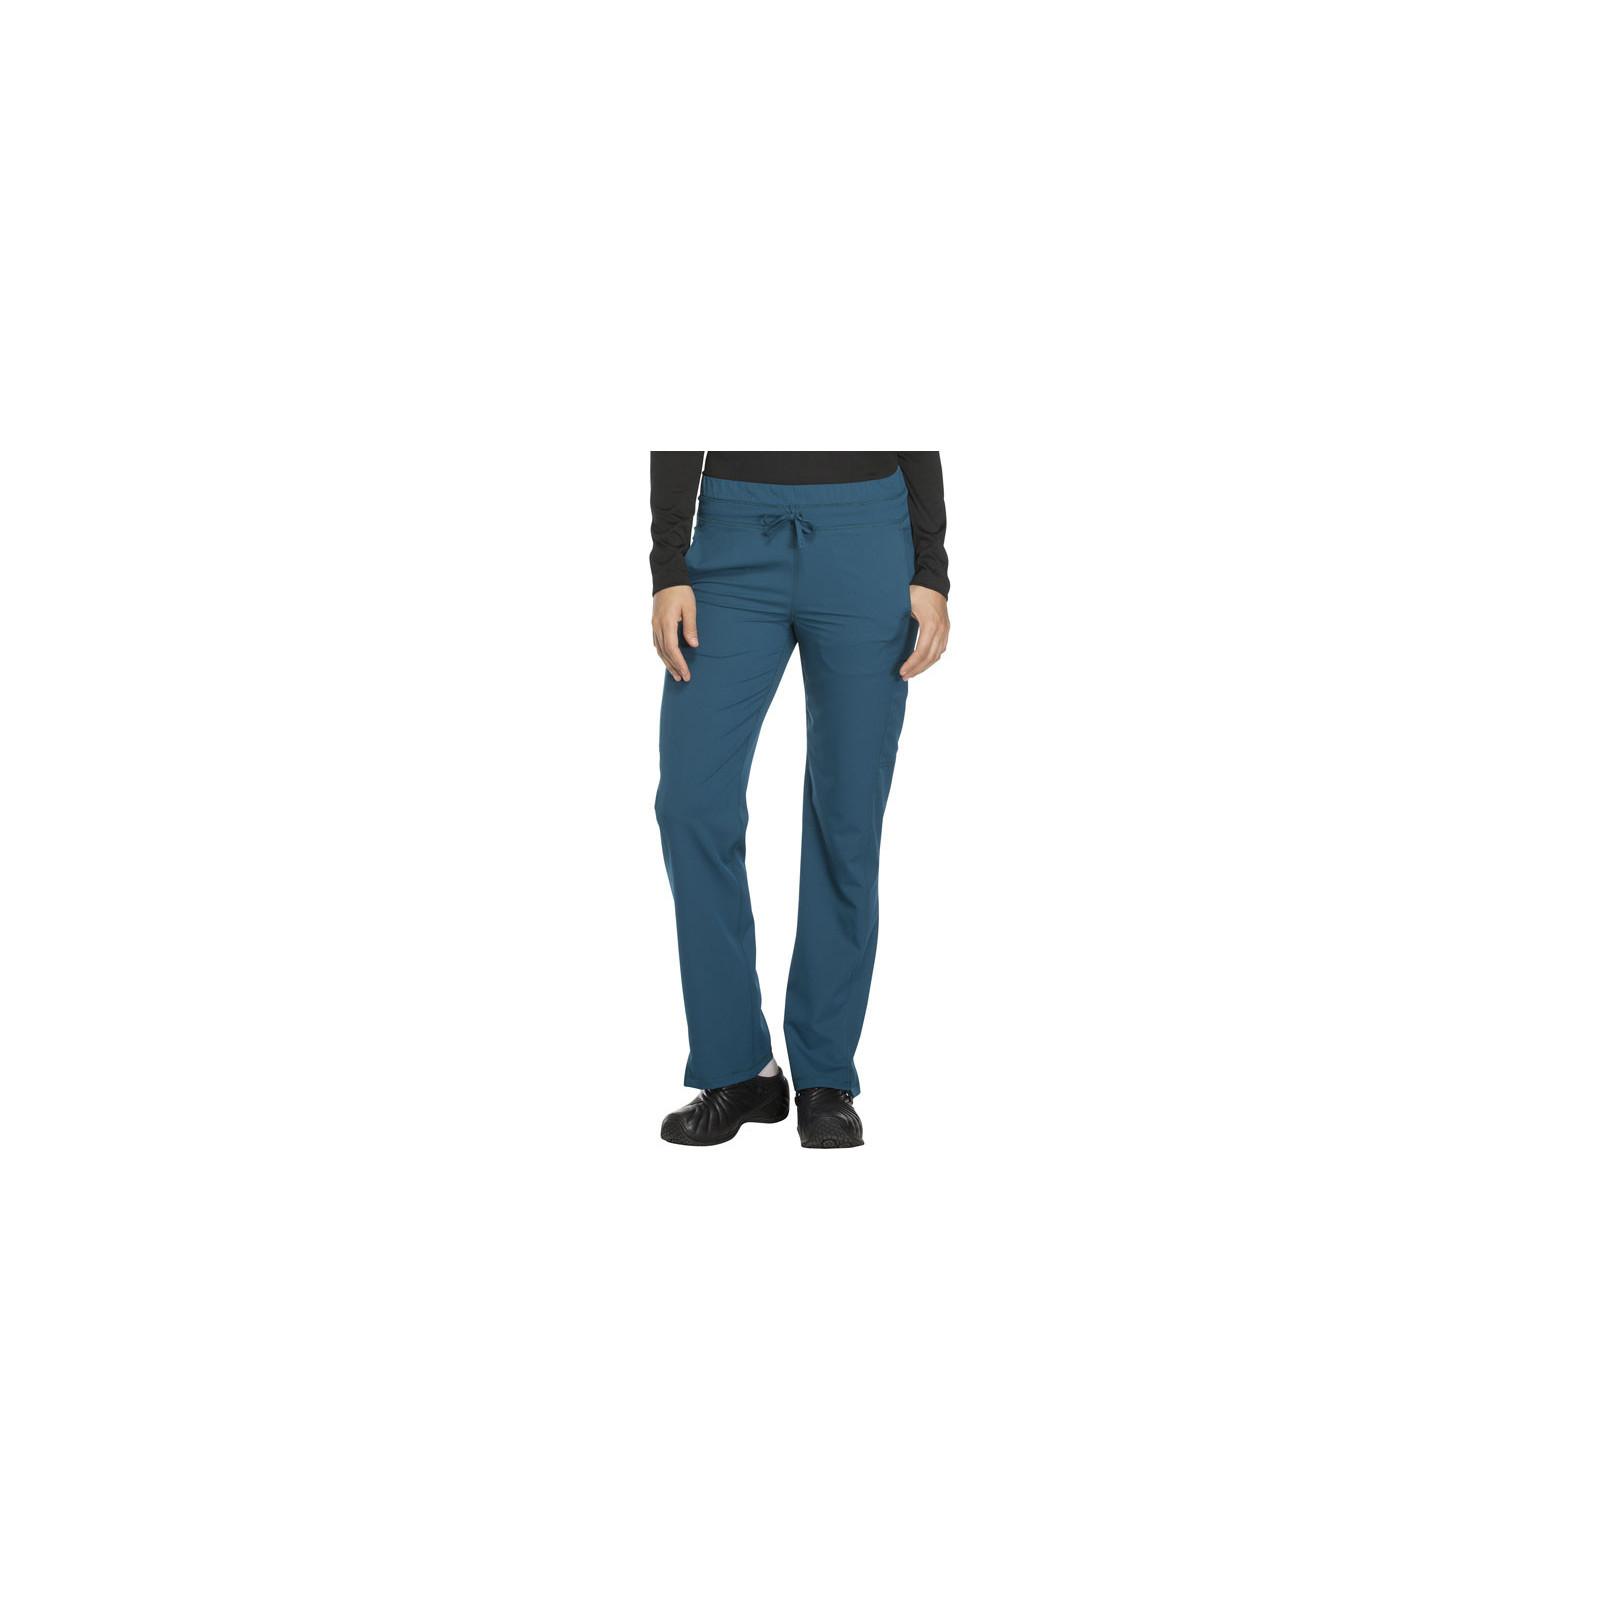 "Pantalon Médical femme Dickies, Collection ""Dynamix"" (DK130) caraïbe face"